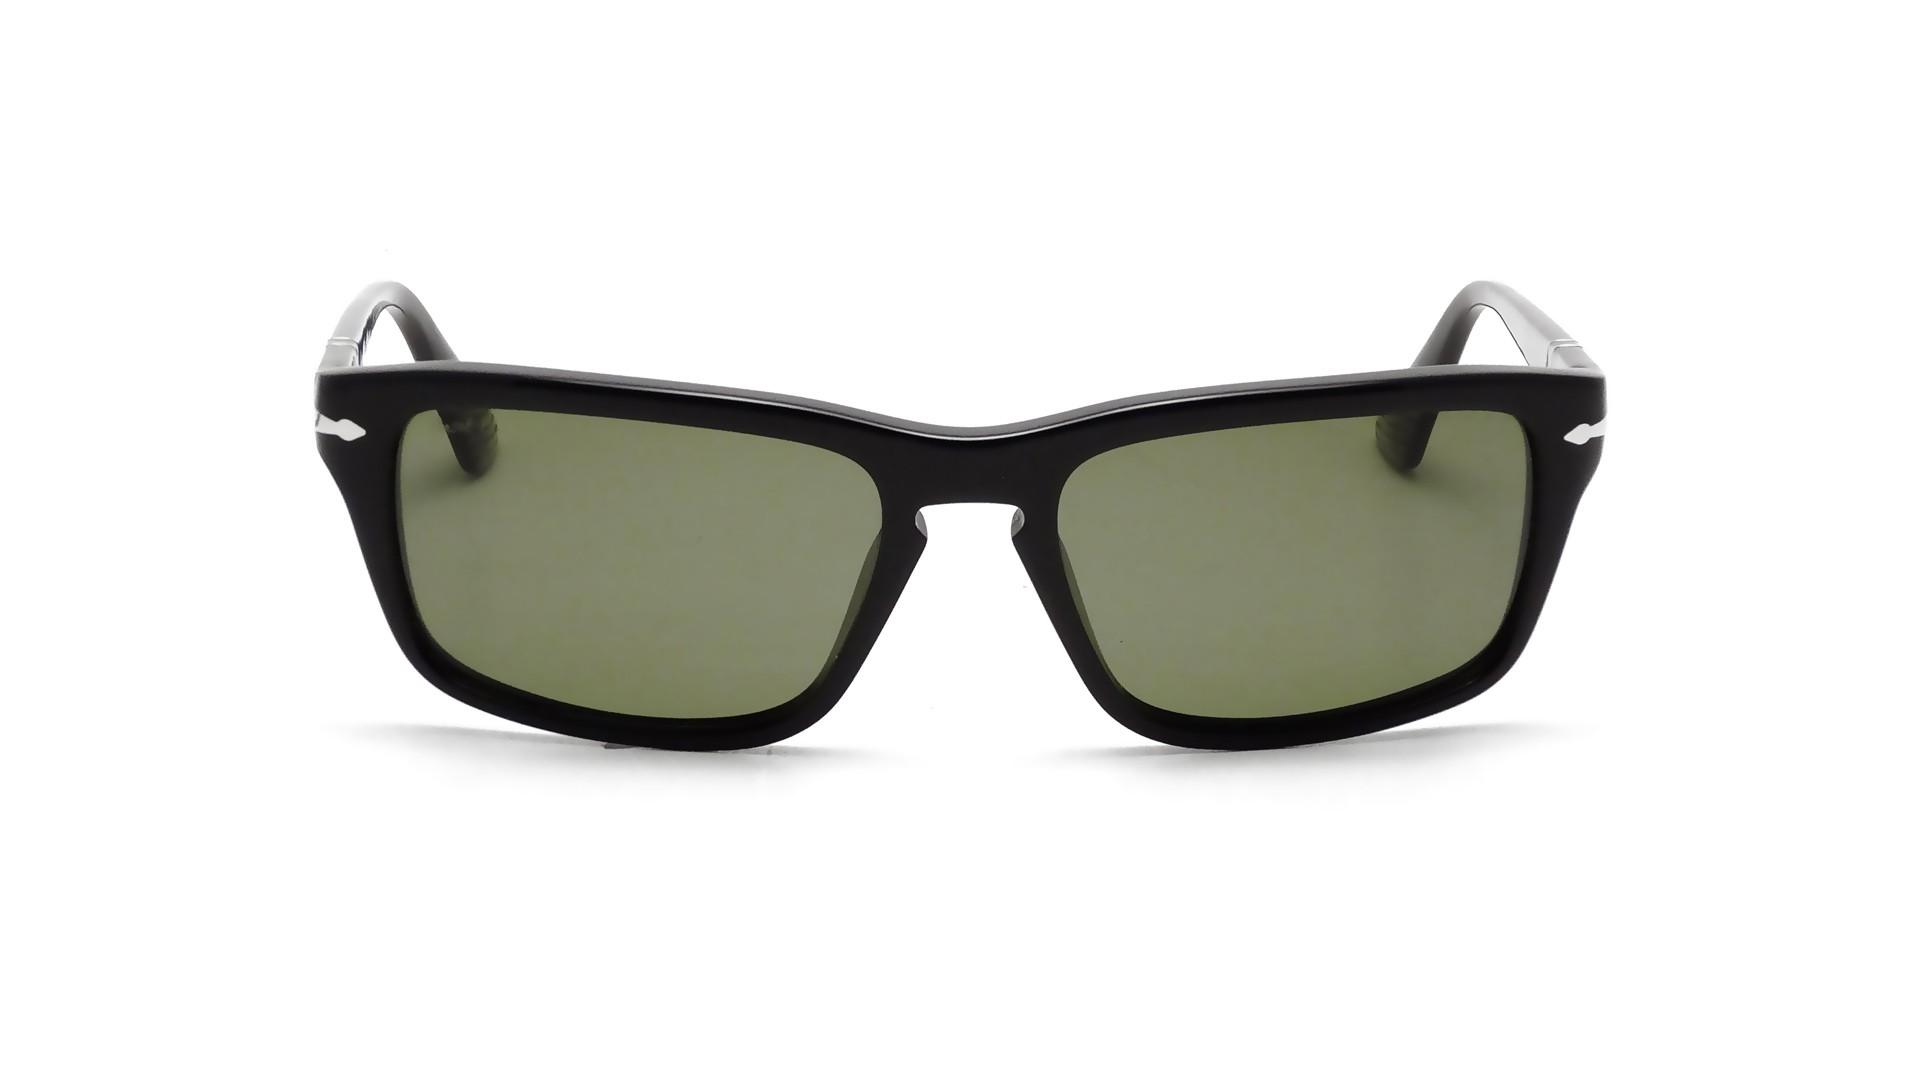 08e24ff7a8ea7 Persol Film Noir Sunglasses